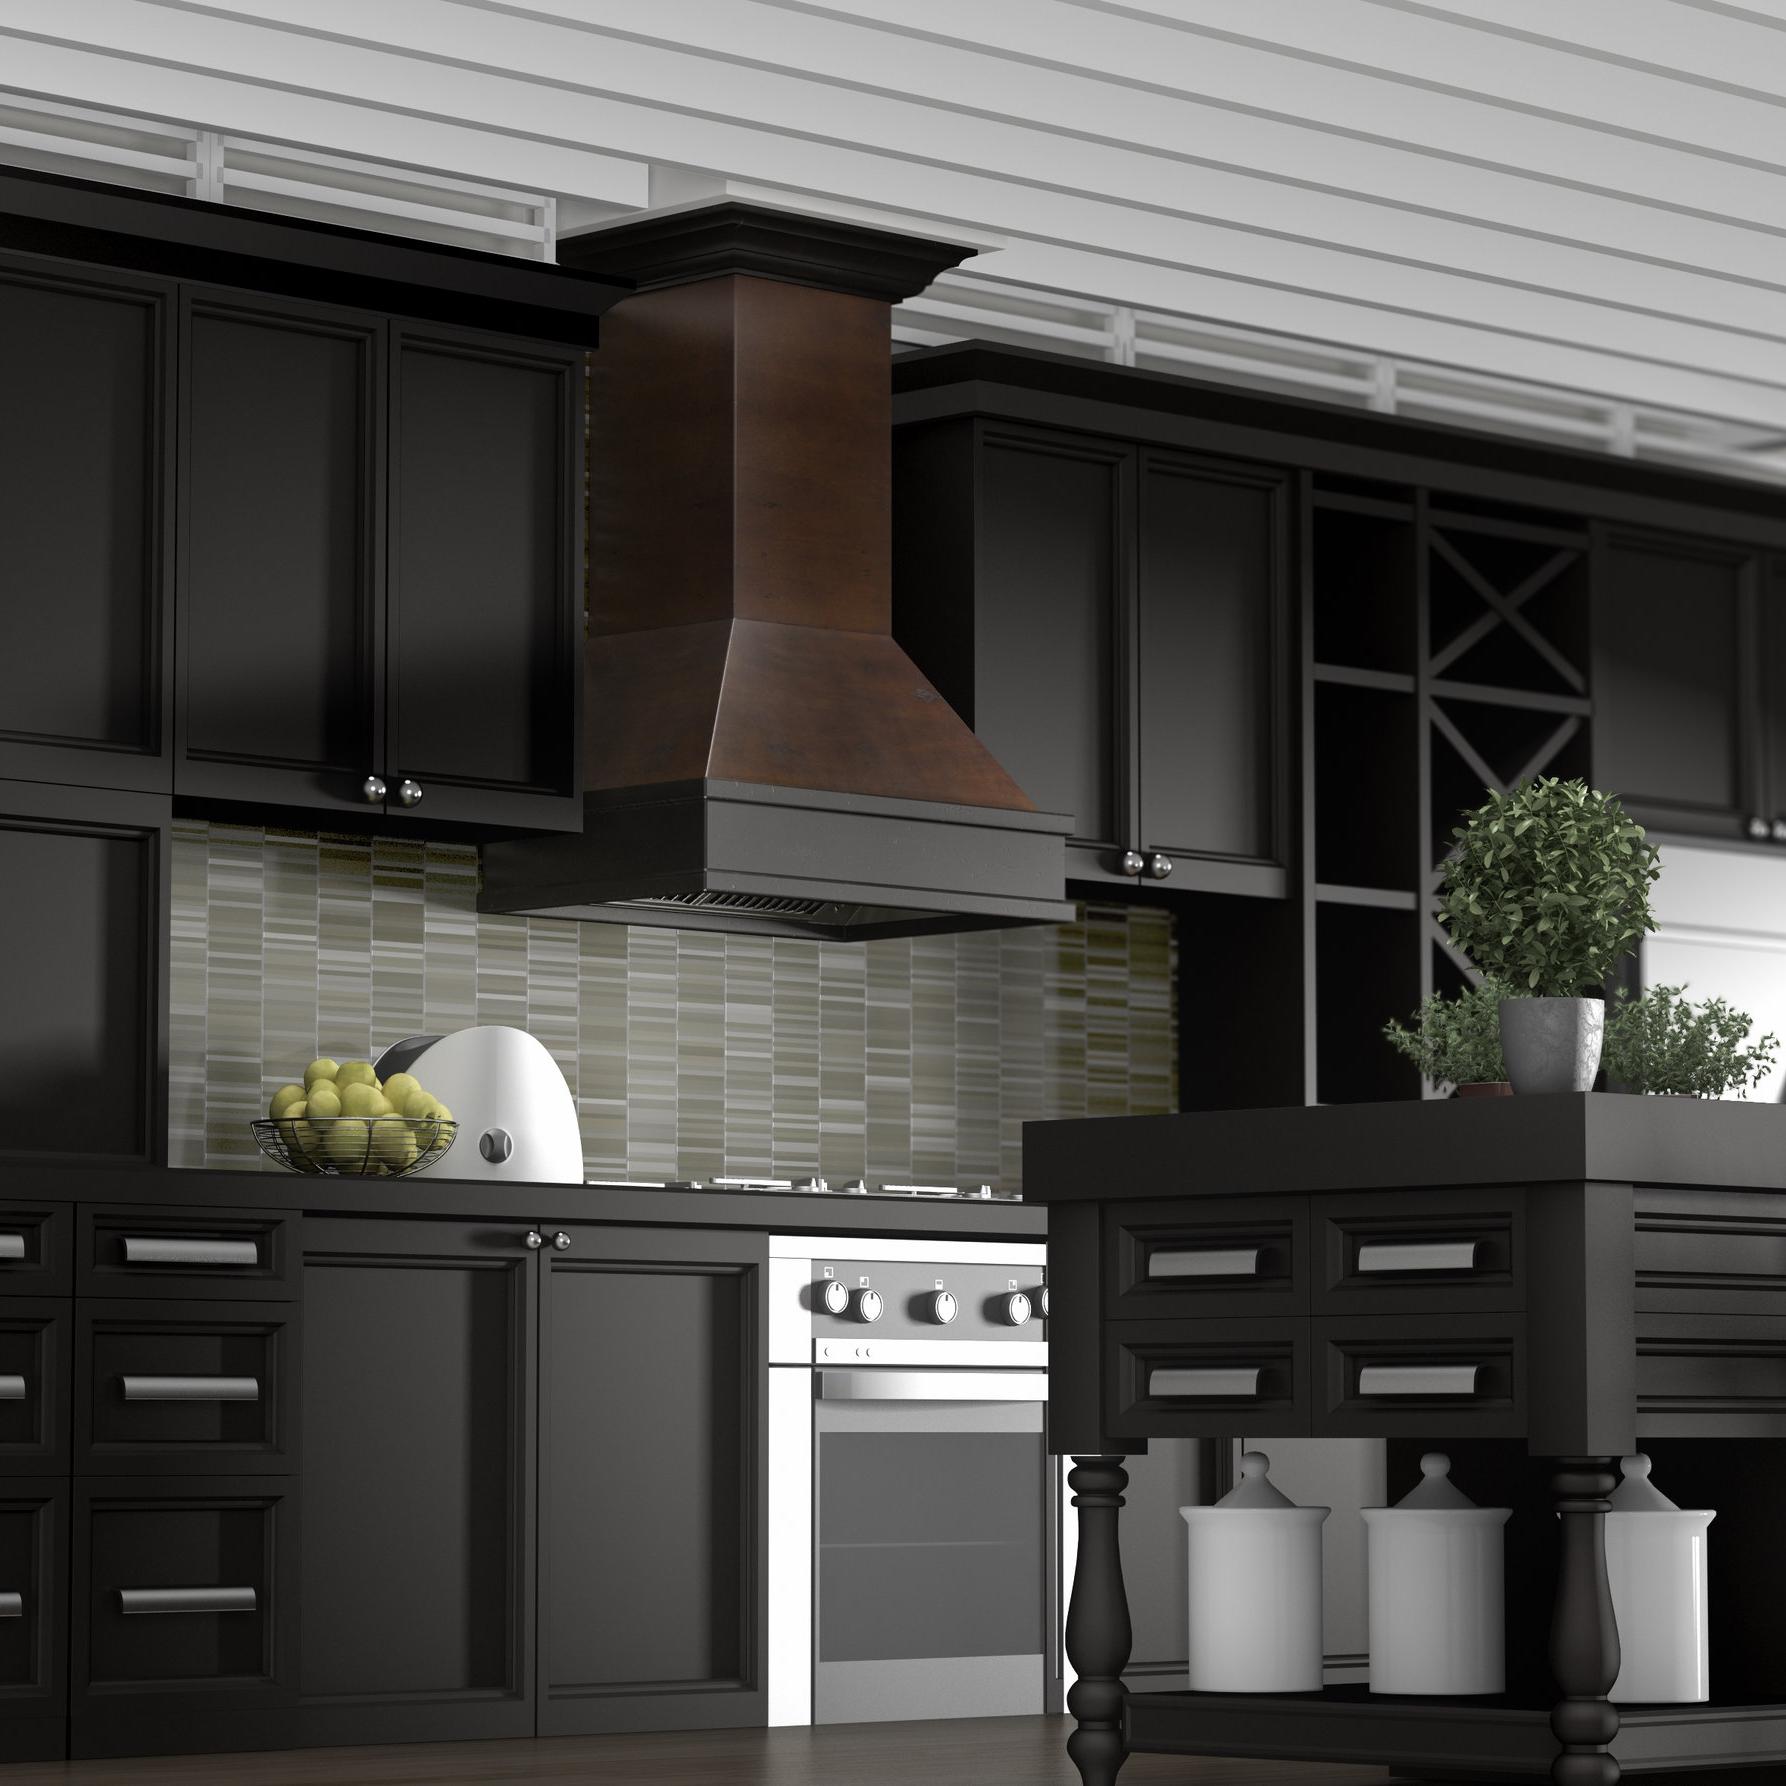 custom-wood-range-hood-zline-329AH-kitchen-scene.jpg